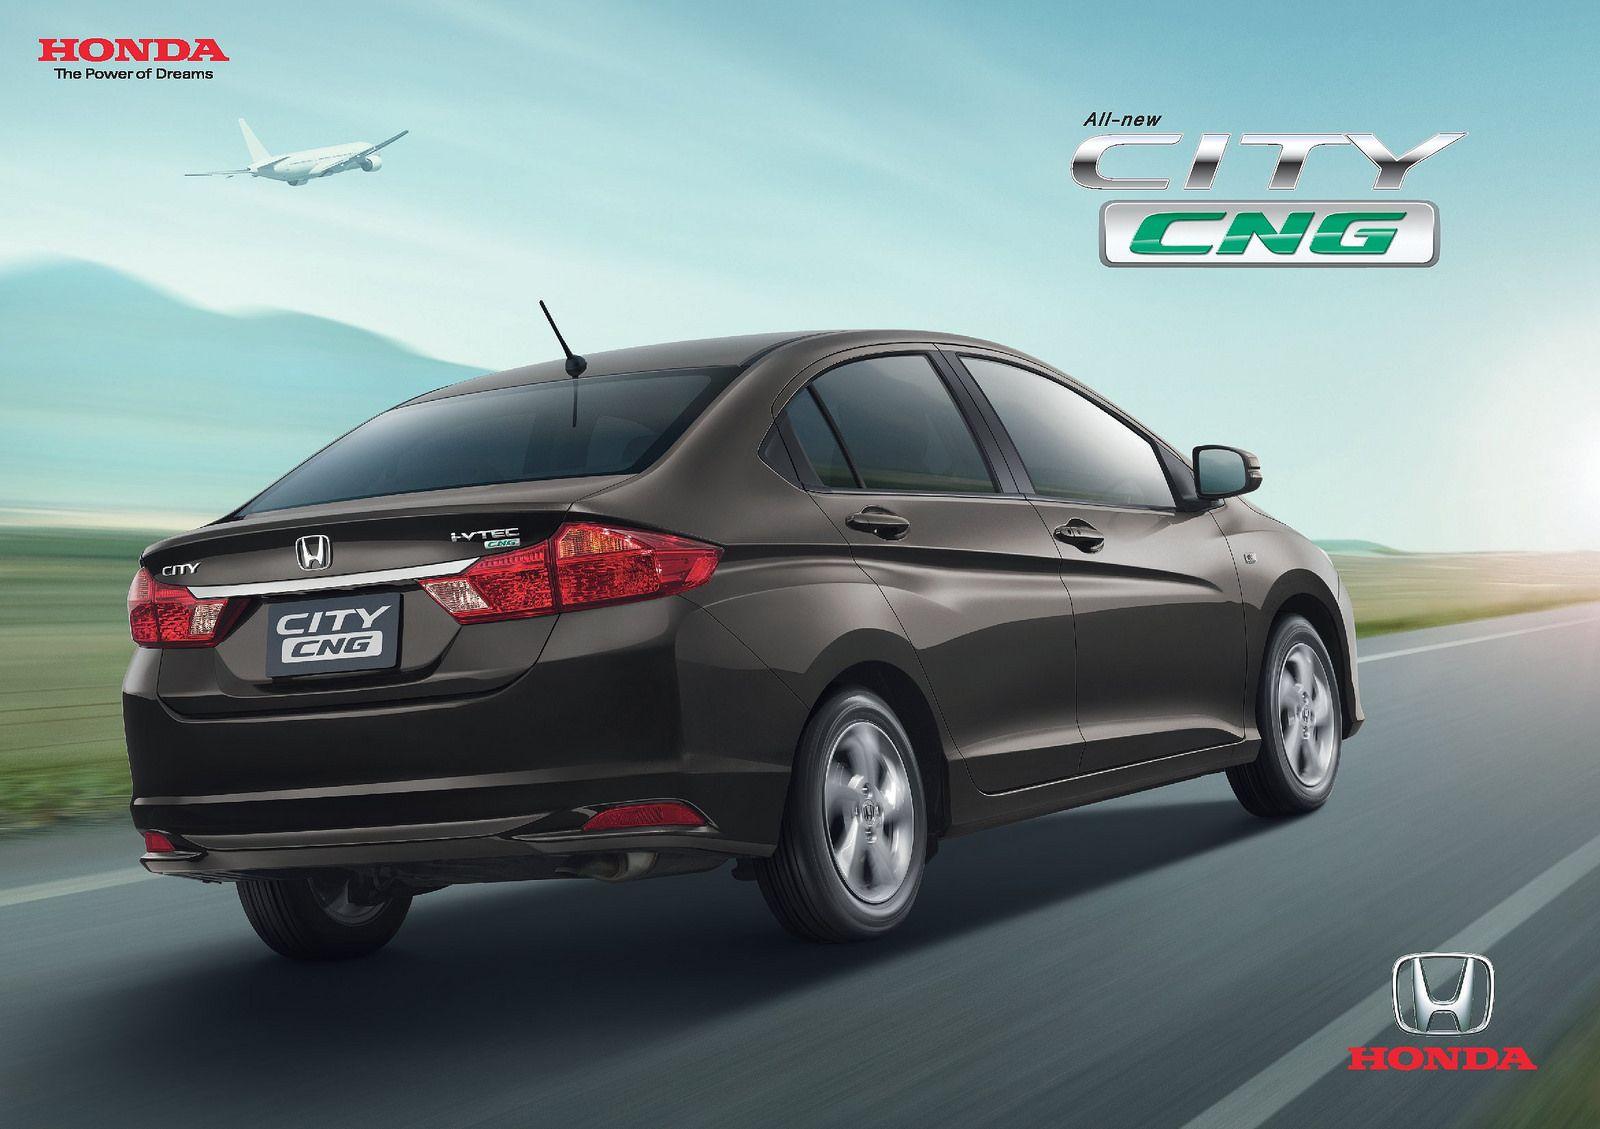 Honda City Mk6 CNG Thailand Brochure 2014